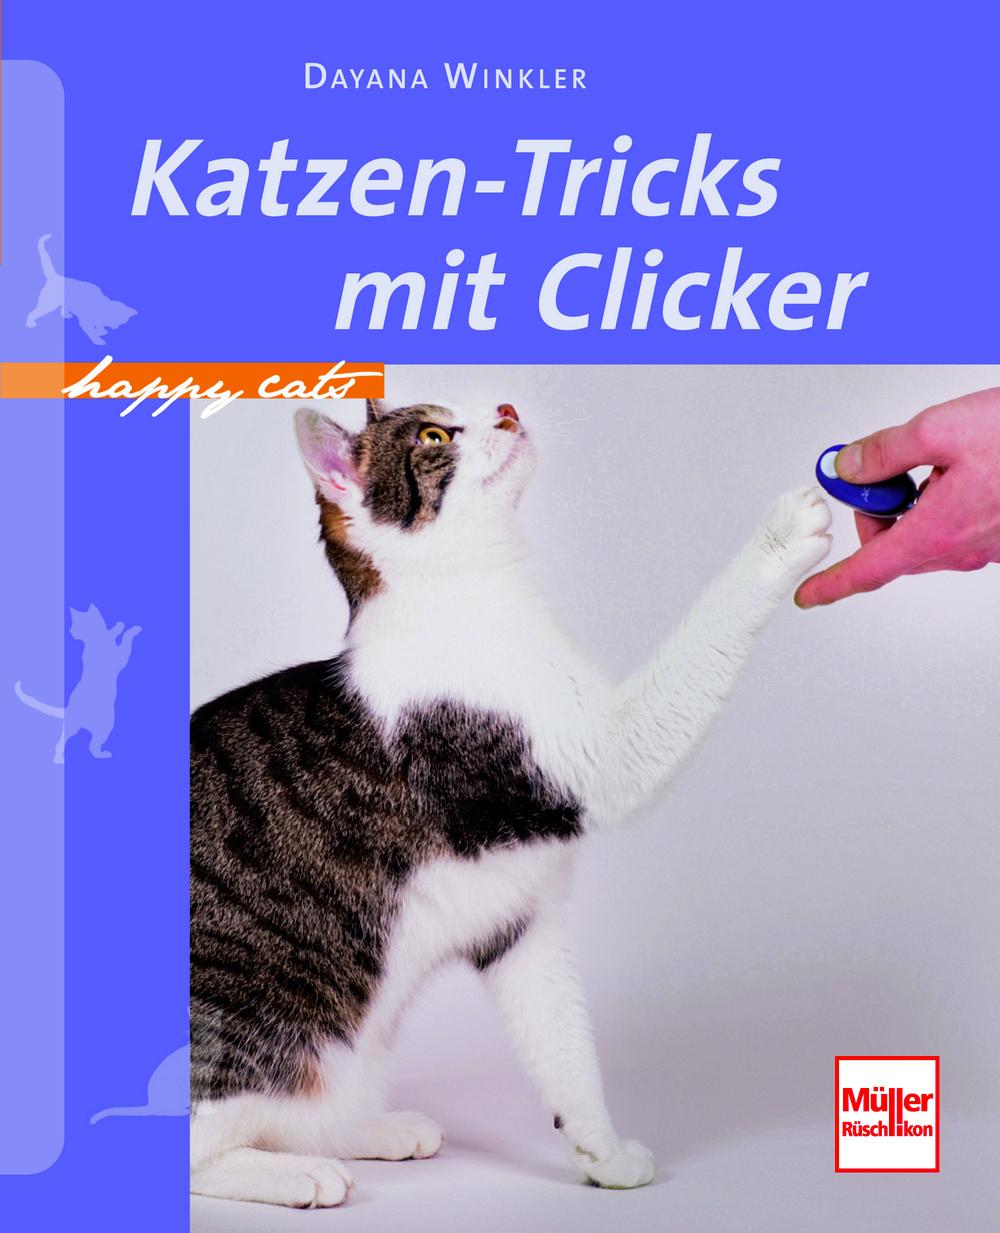 Müller-Rüschlikon - Katzen-Tricks mit Clicker